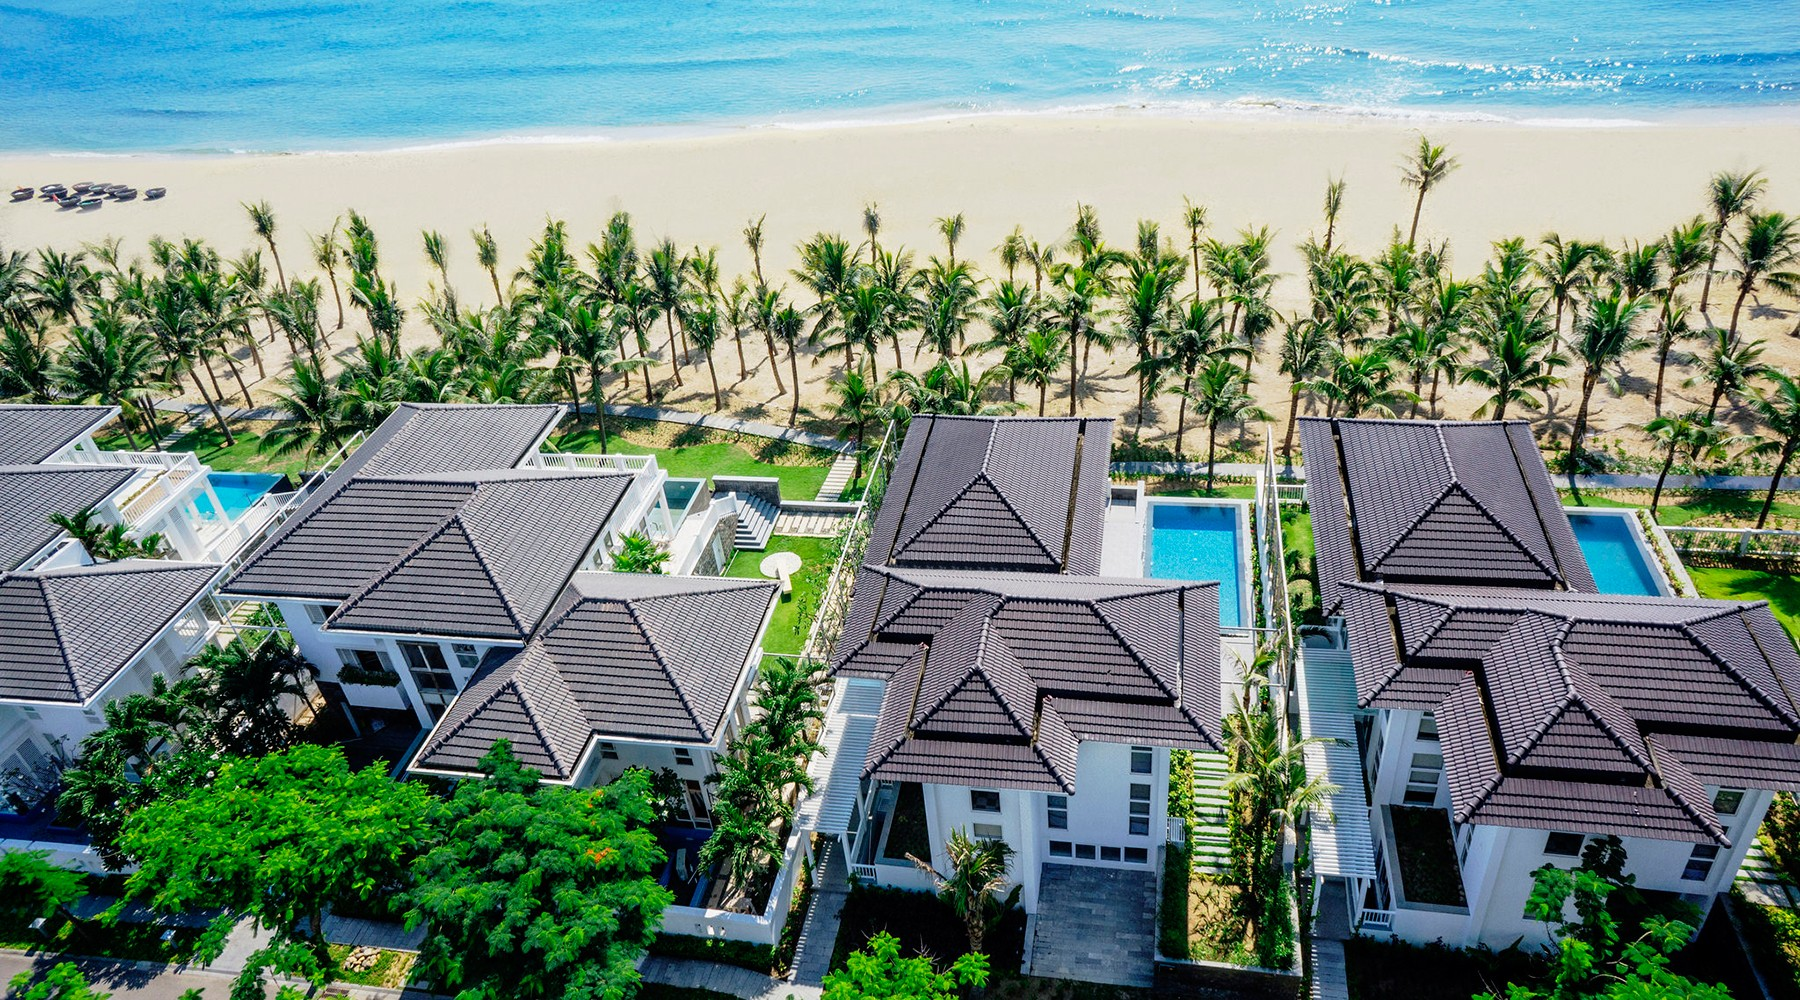 Phối cảnh Premier Village Đà nẵng